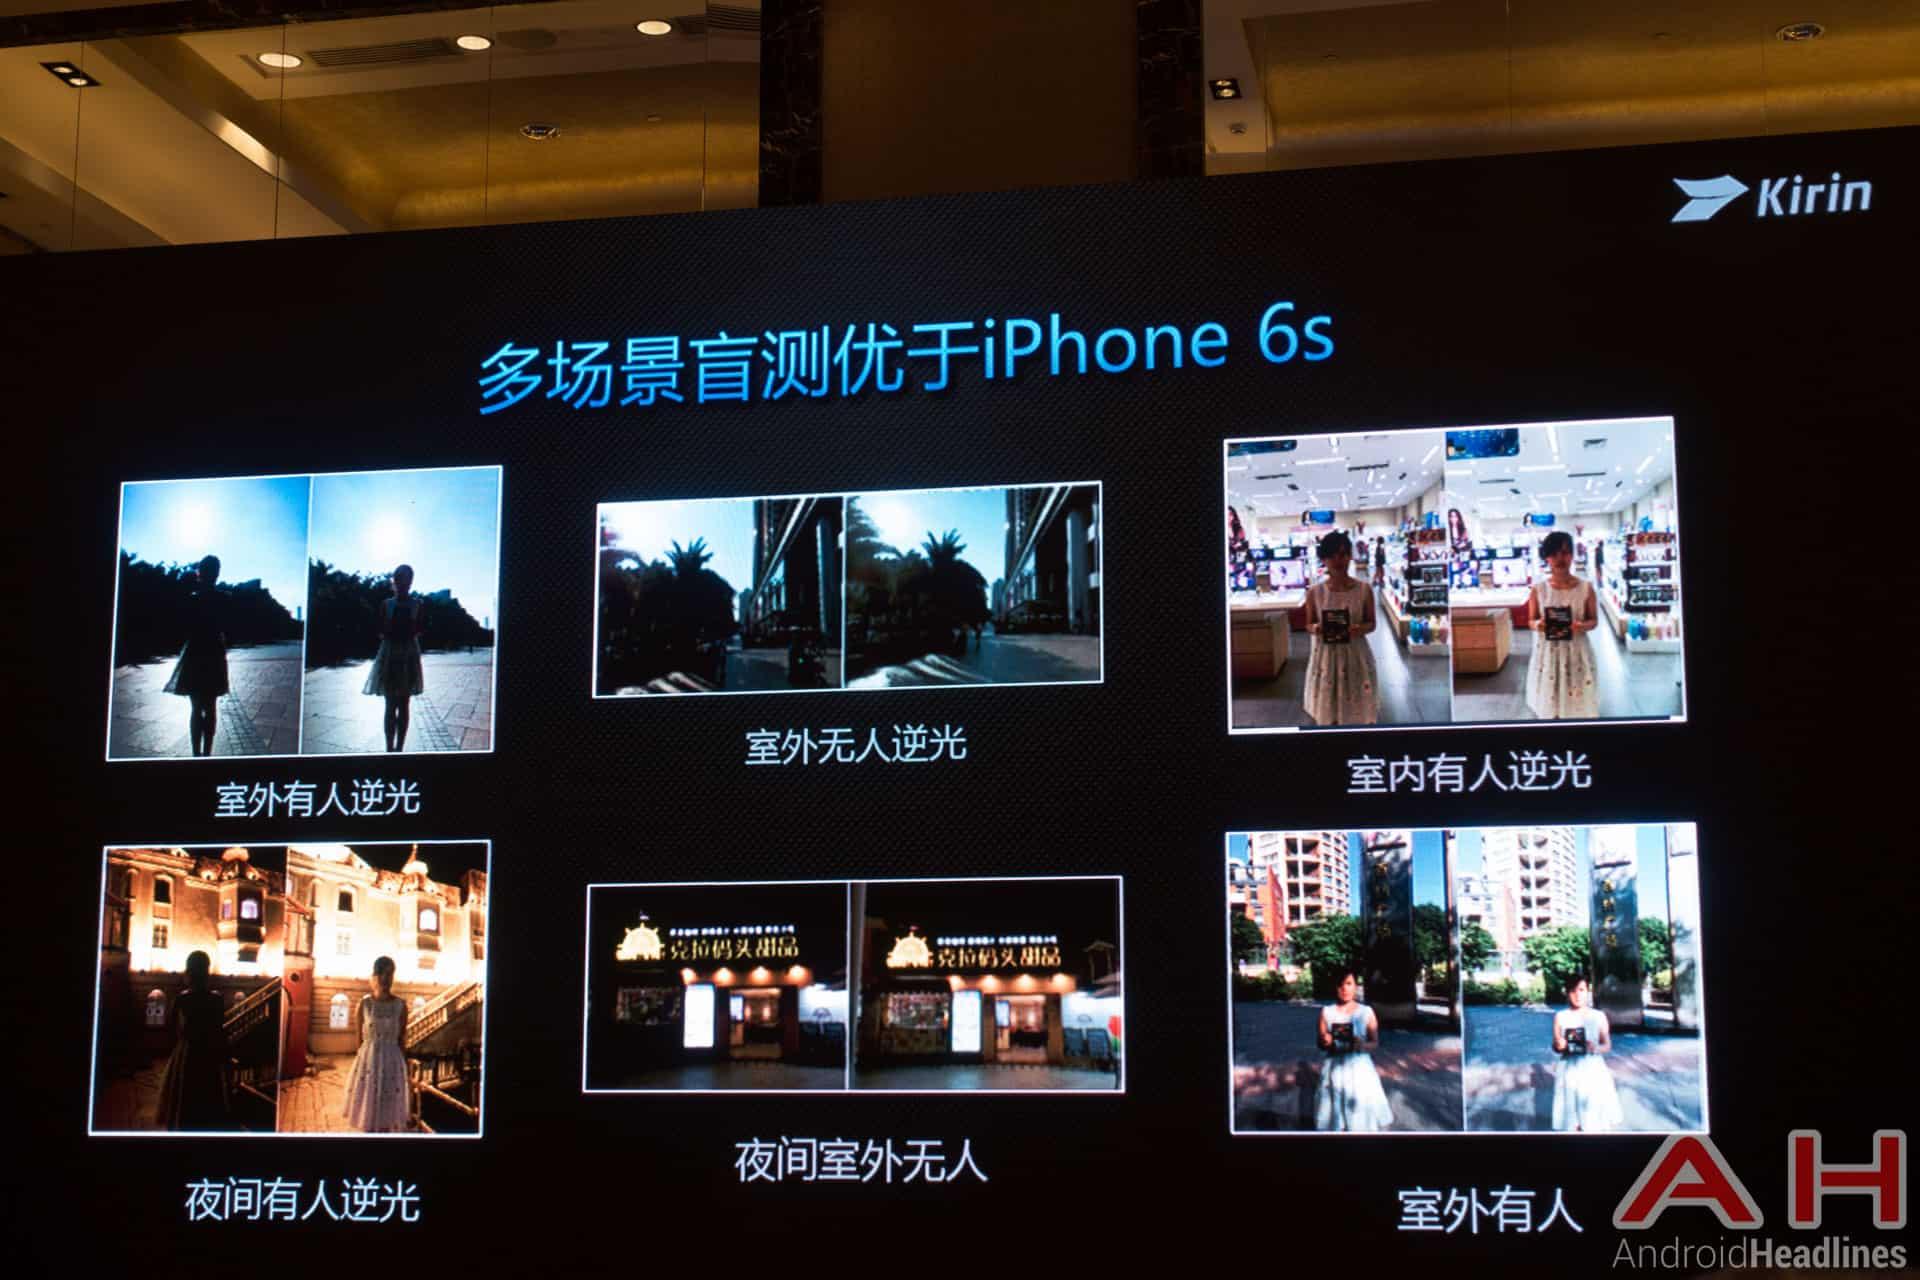 Huawei Kirin 950 AH 6 2